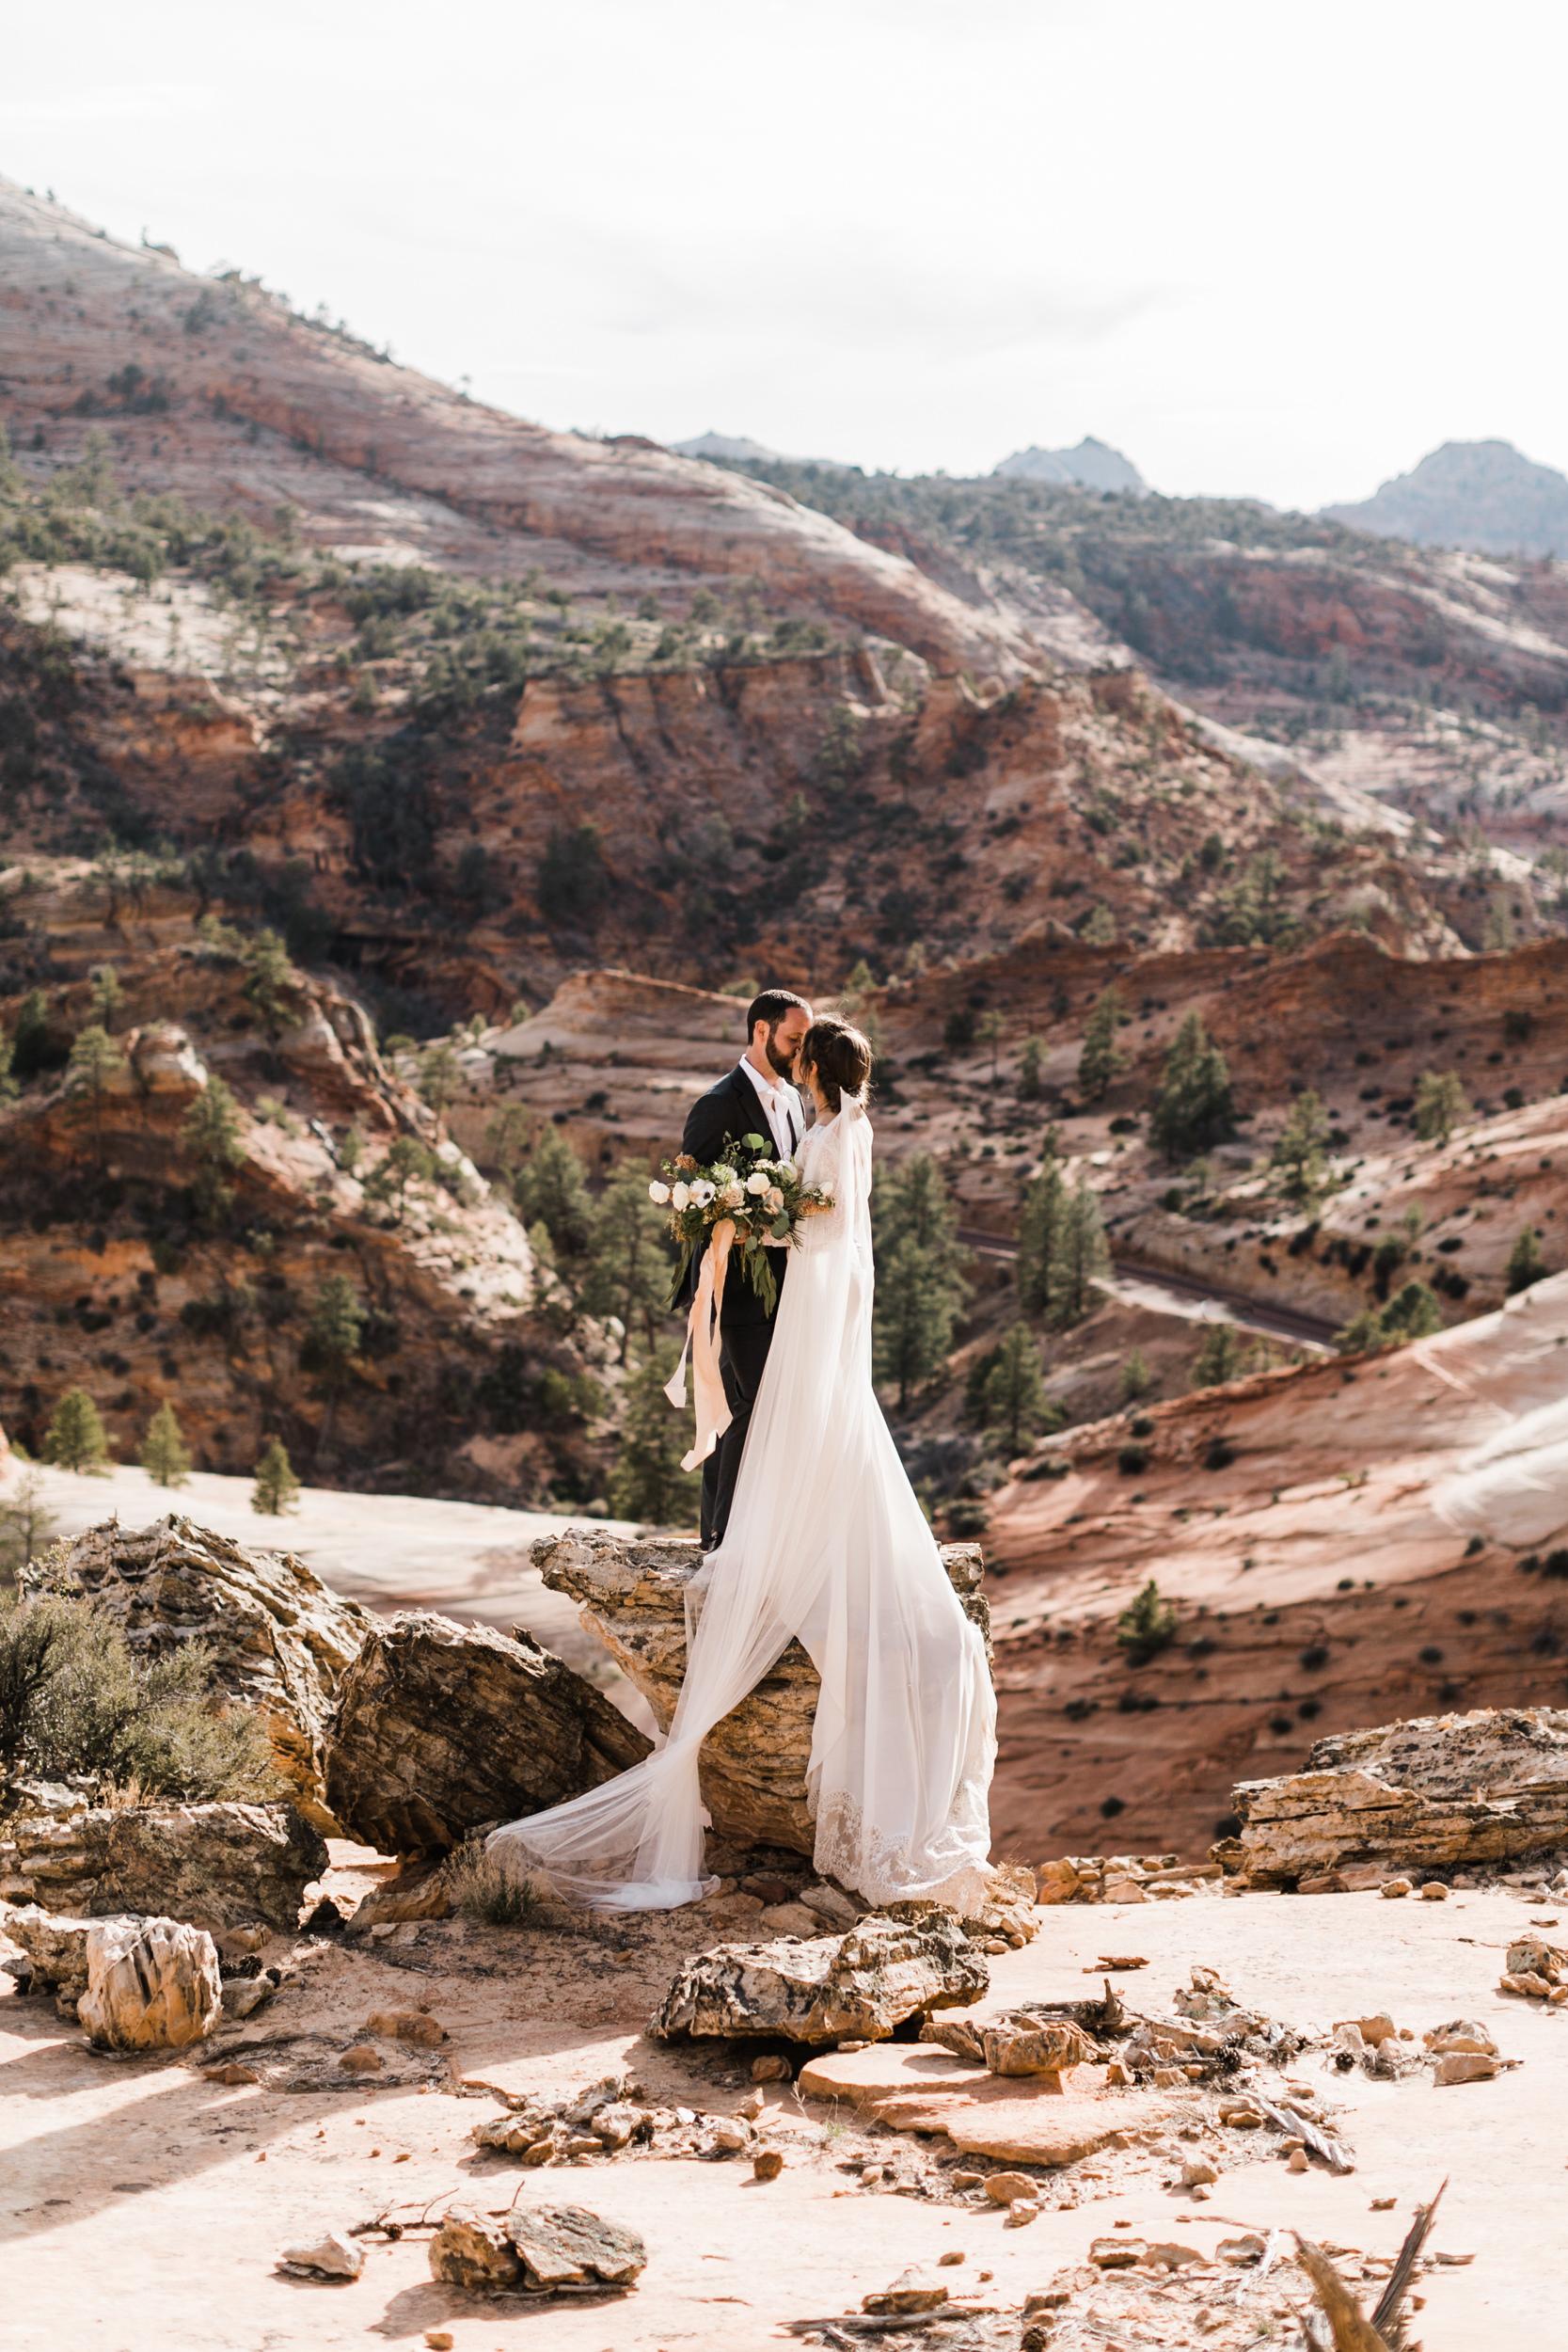 Zion-National-Park-Adventure-Wedding-Hearnes-Elopement-Photography-32.jpg